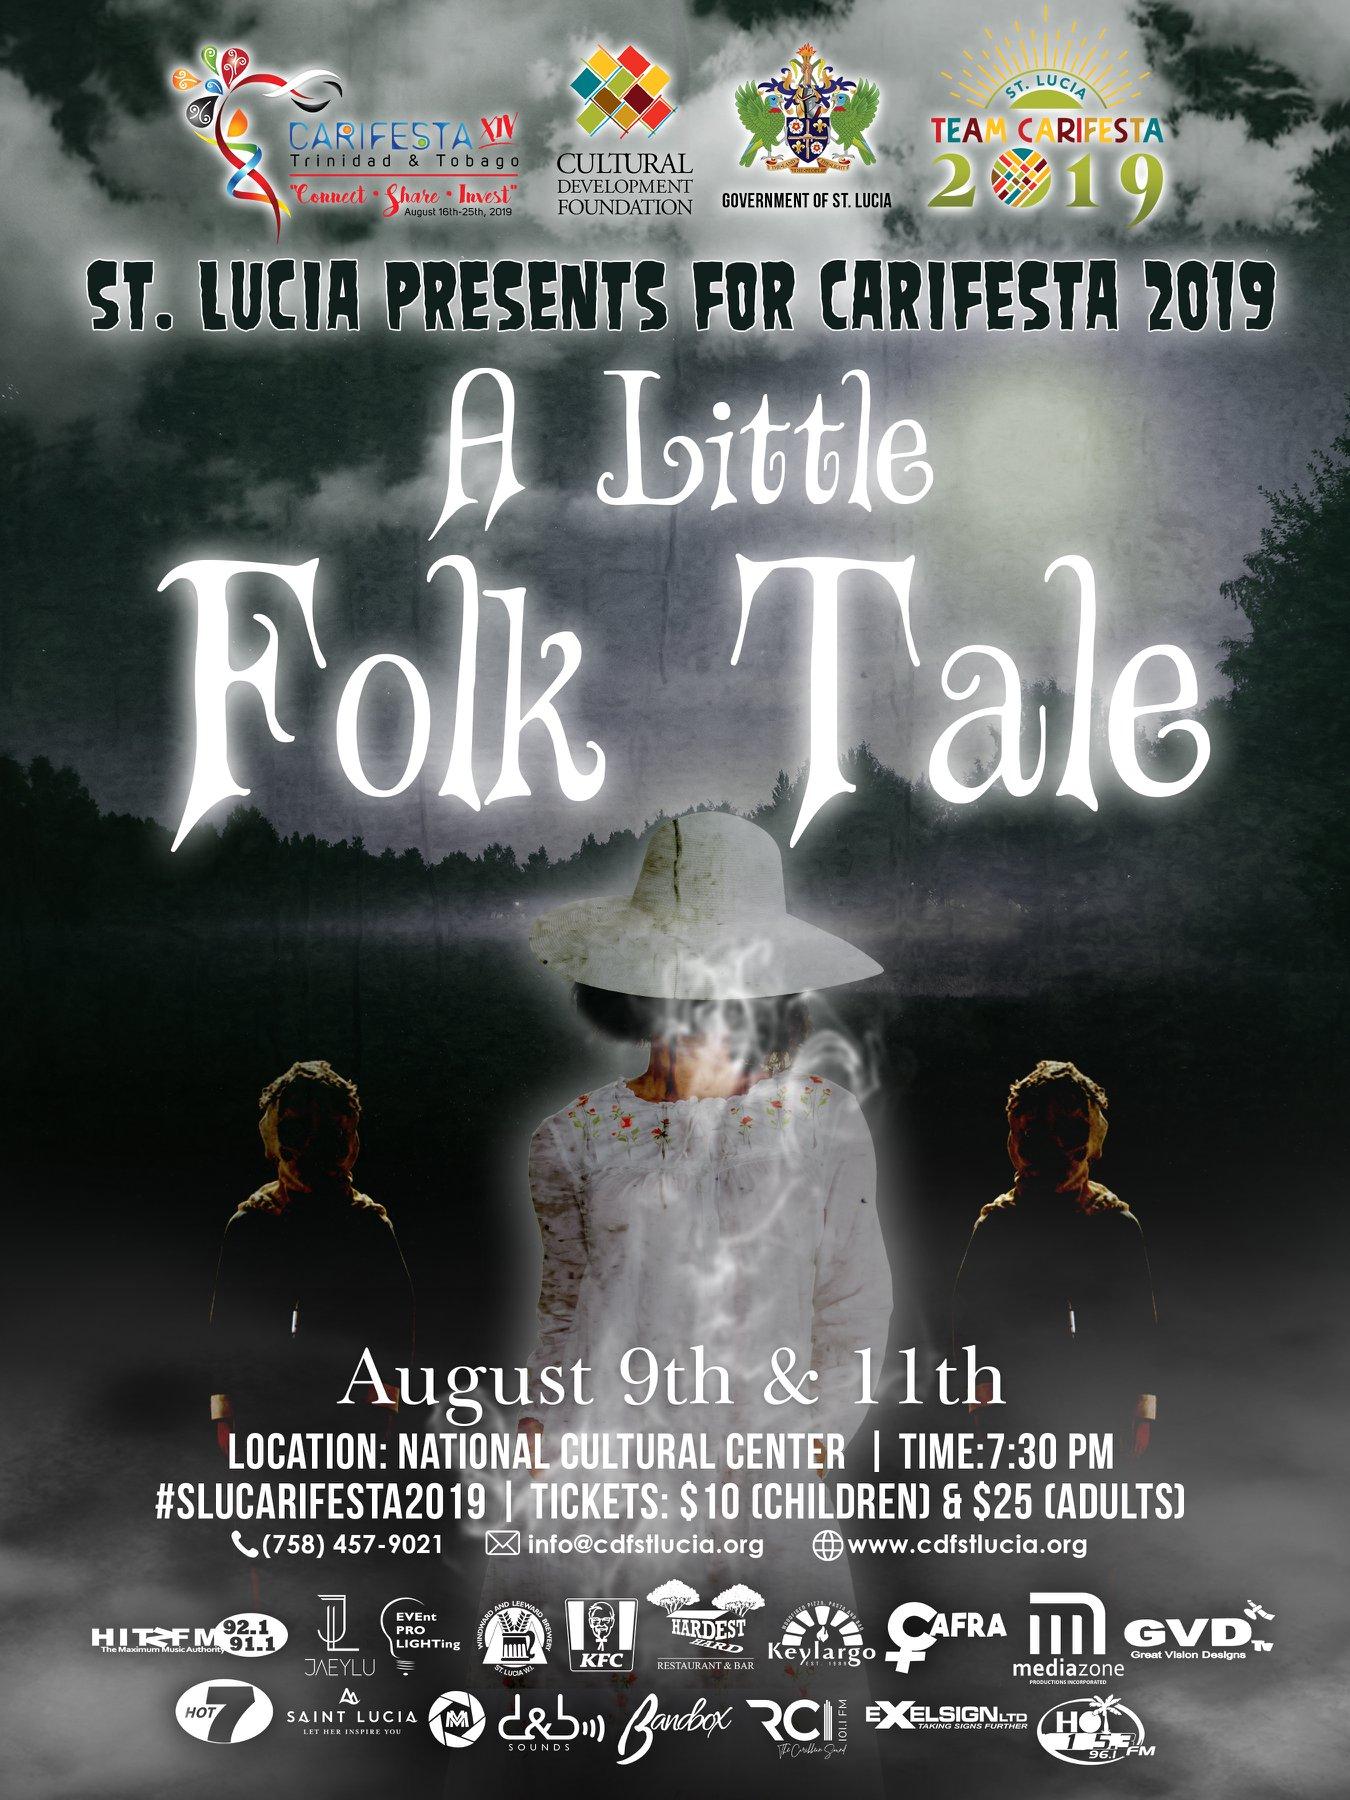 what to do in st lucia theatre A little folk tale saint lucia's carifesta presentation